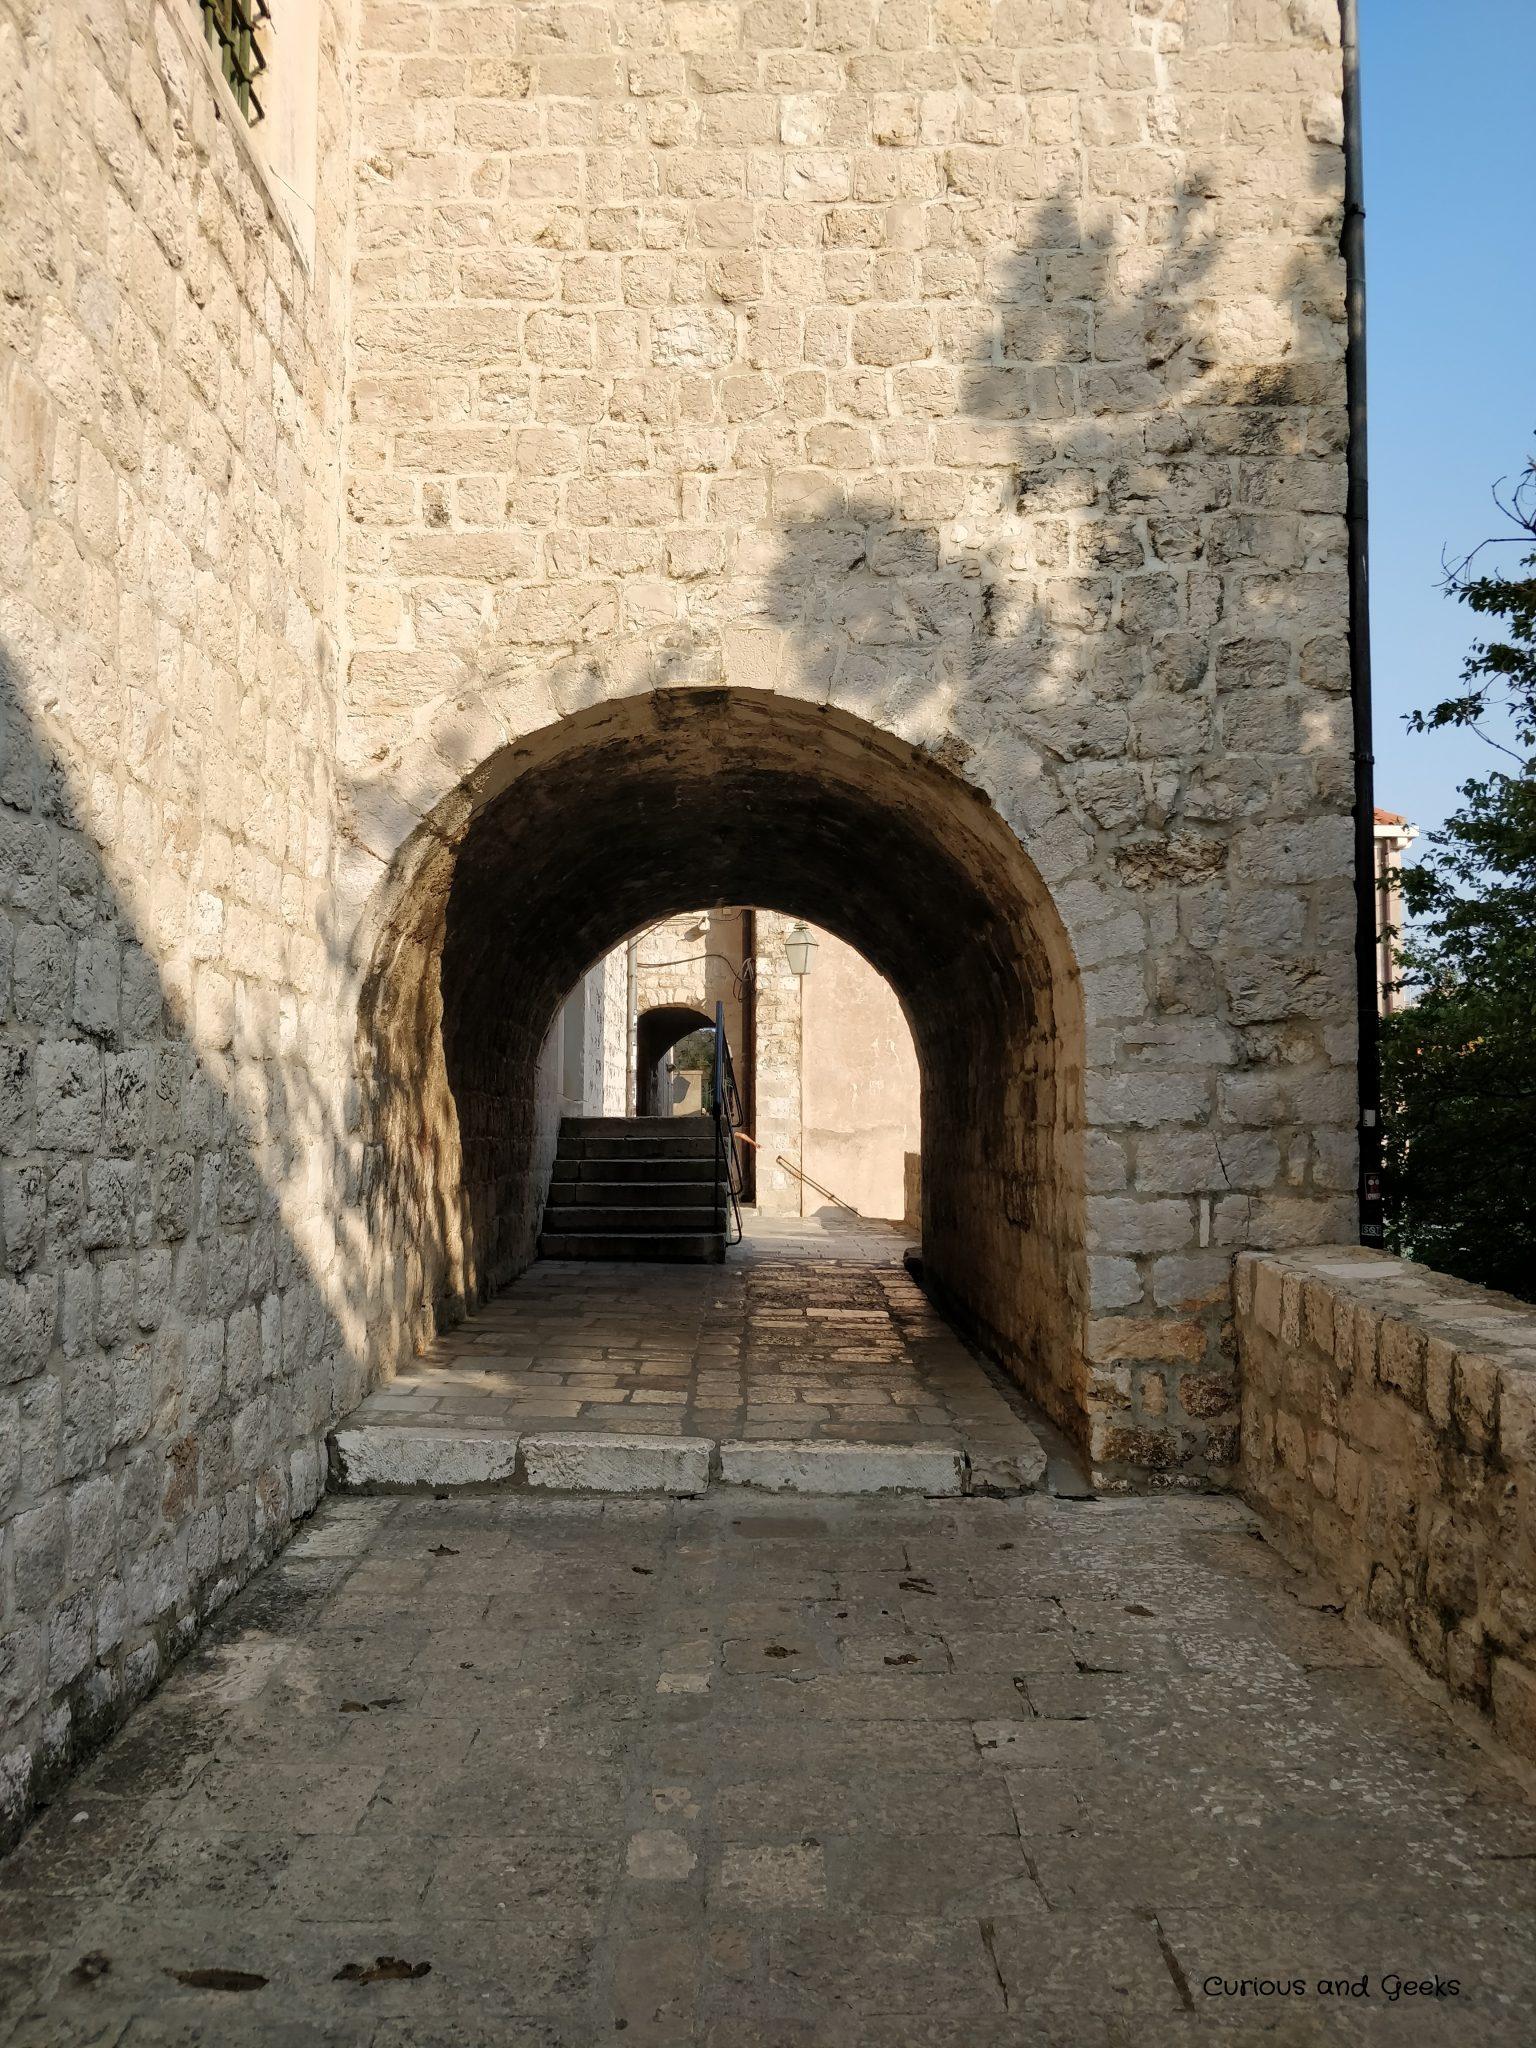 2.Ethnographic Museum - Game of Thrones filming locations in Dubrovnik